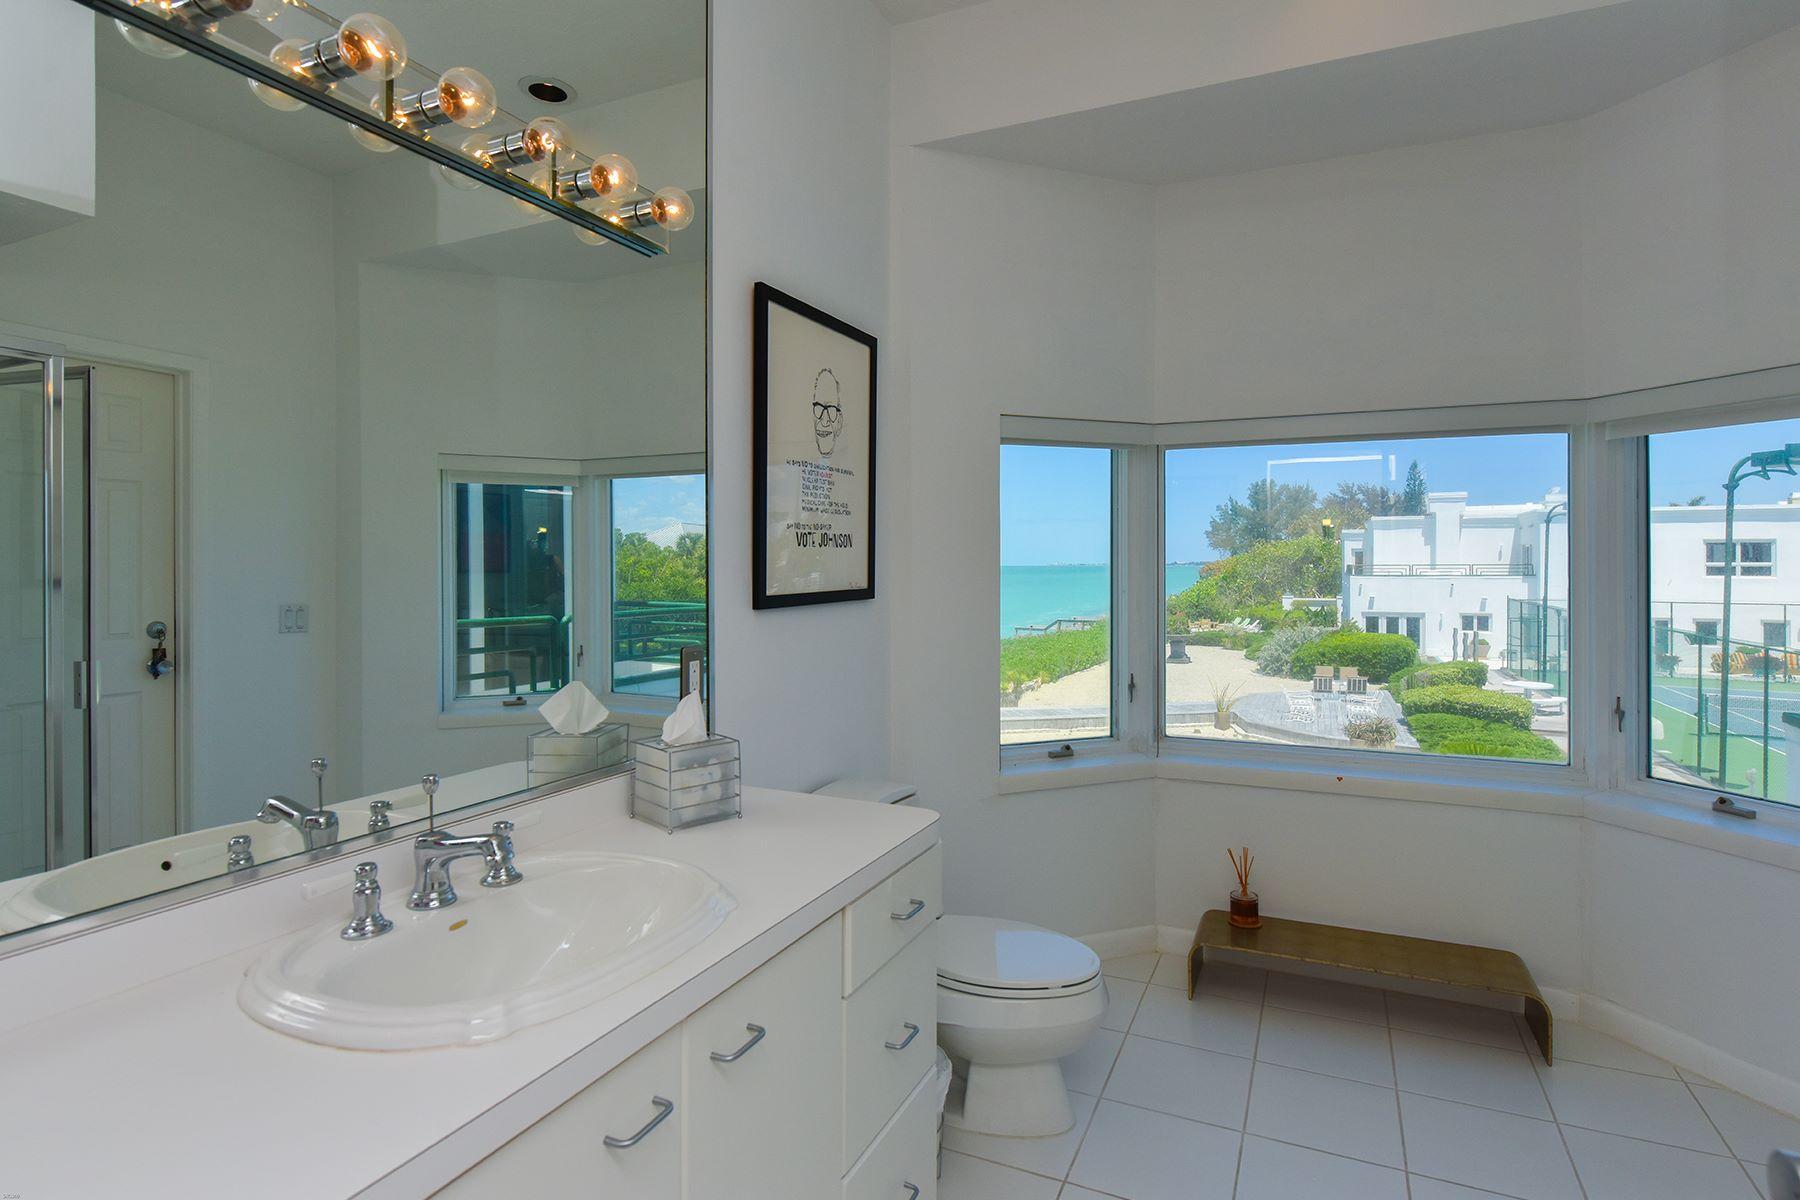 Additional photo for property listing at CASEY KEY 411 N Casey Key Rd,  Osprey, Florida 34229 United States